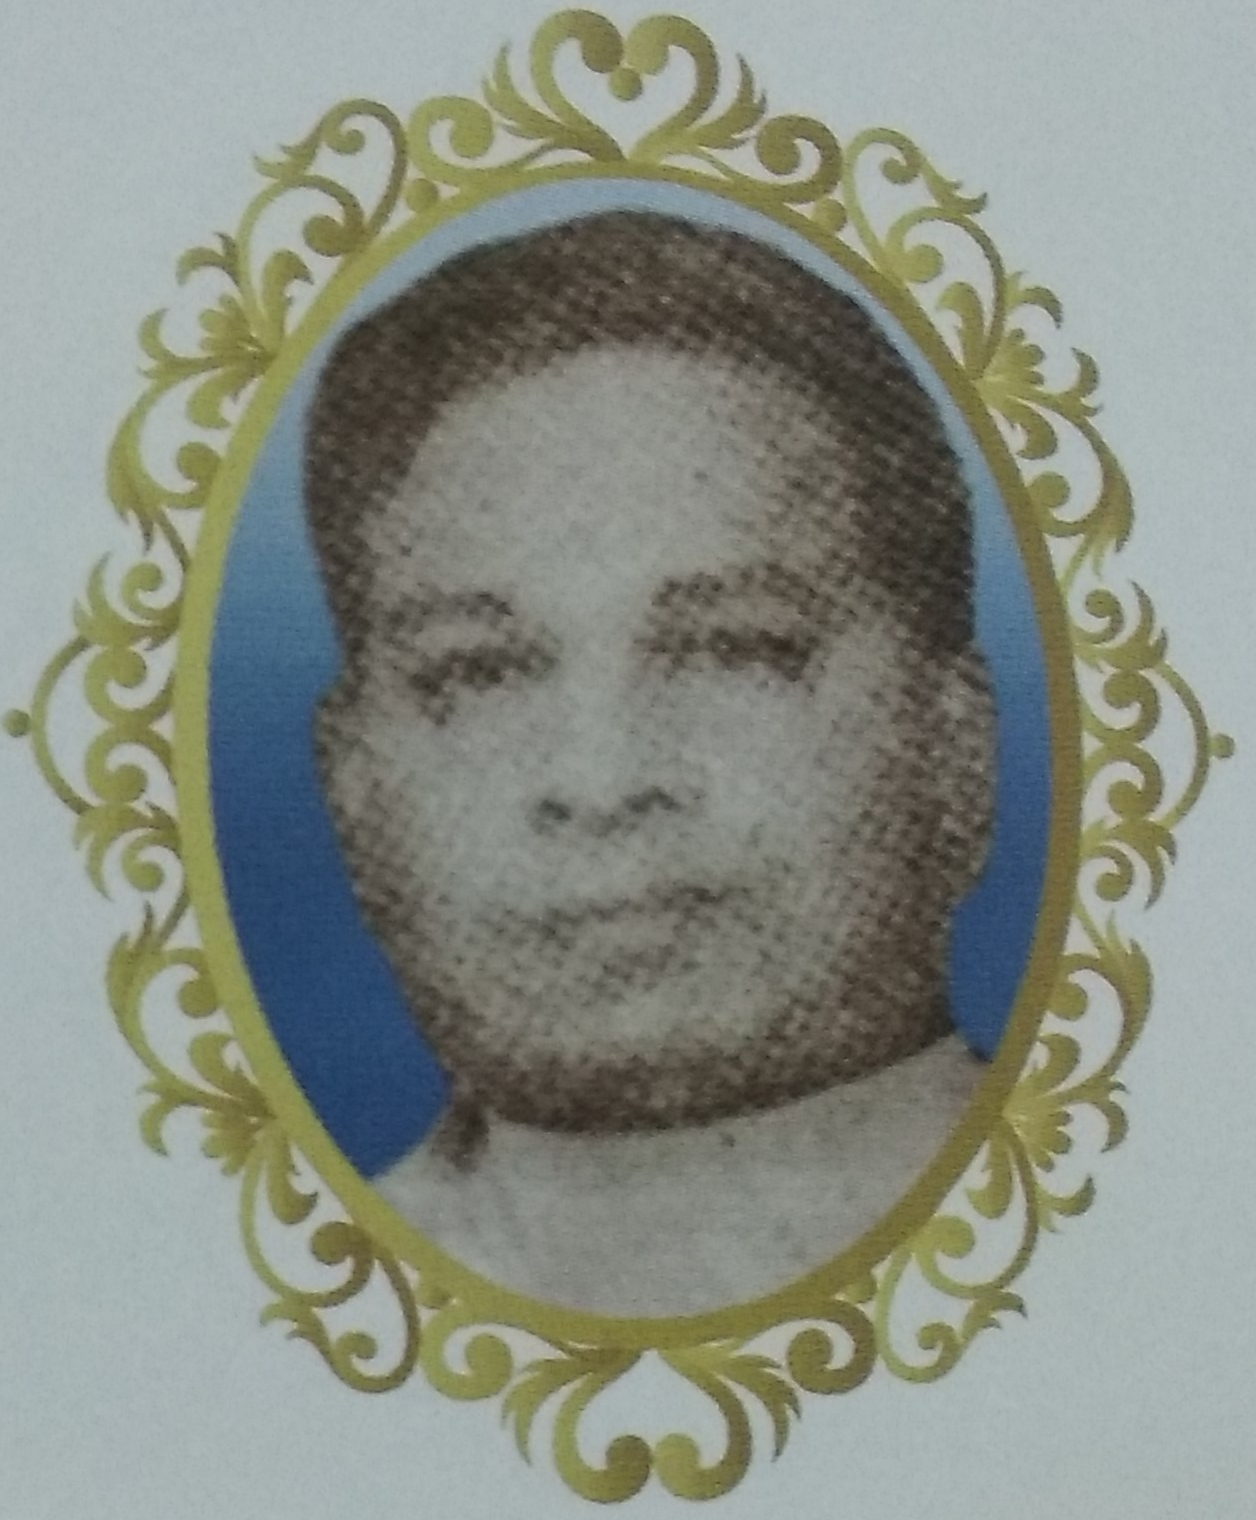 Fr. Bernad Kanapilly